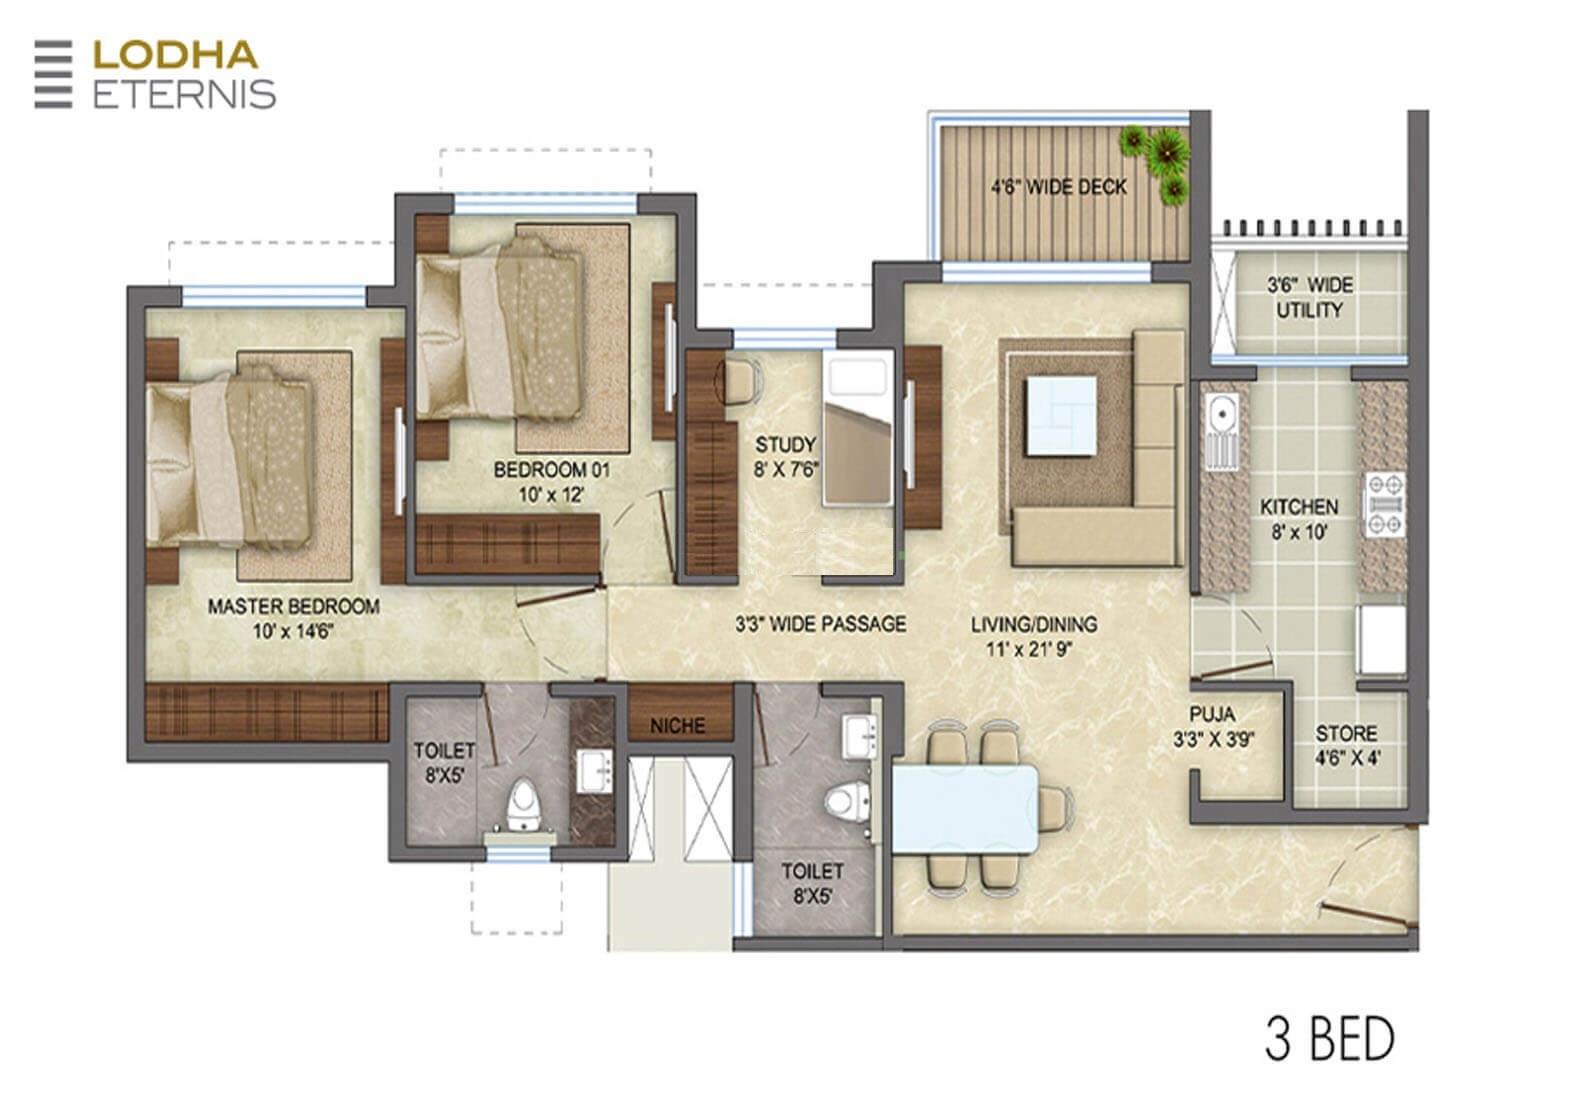 lodha eternis apartment 3 bhk 894sqft 20215305175359